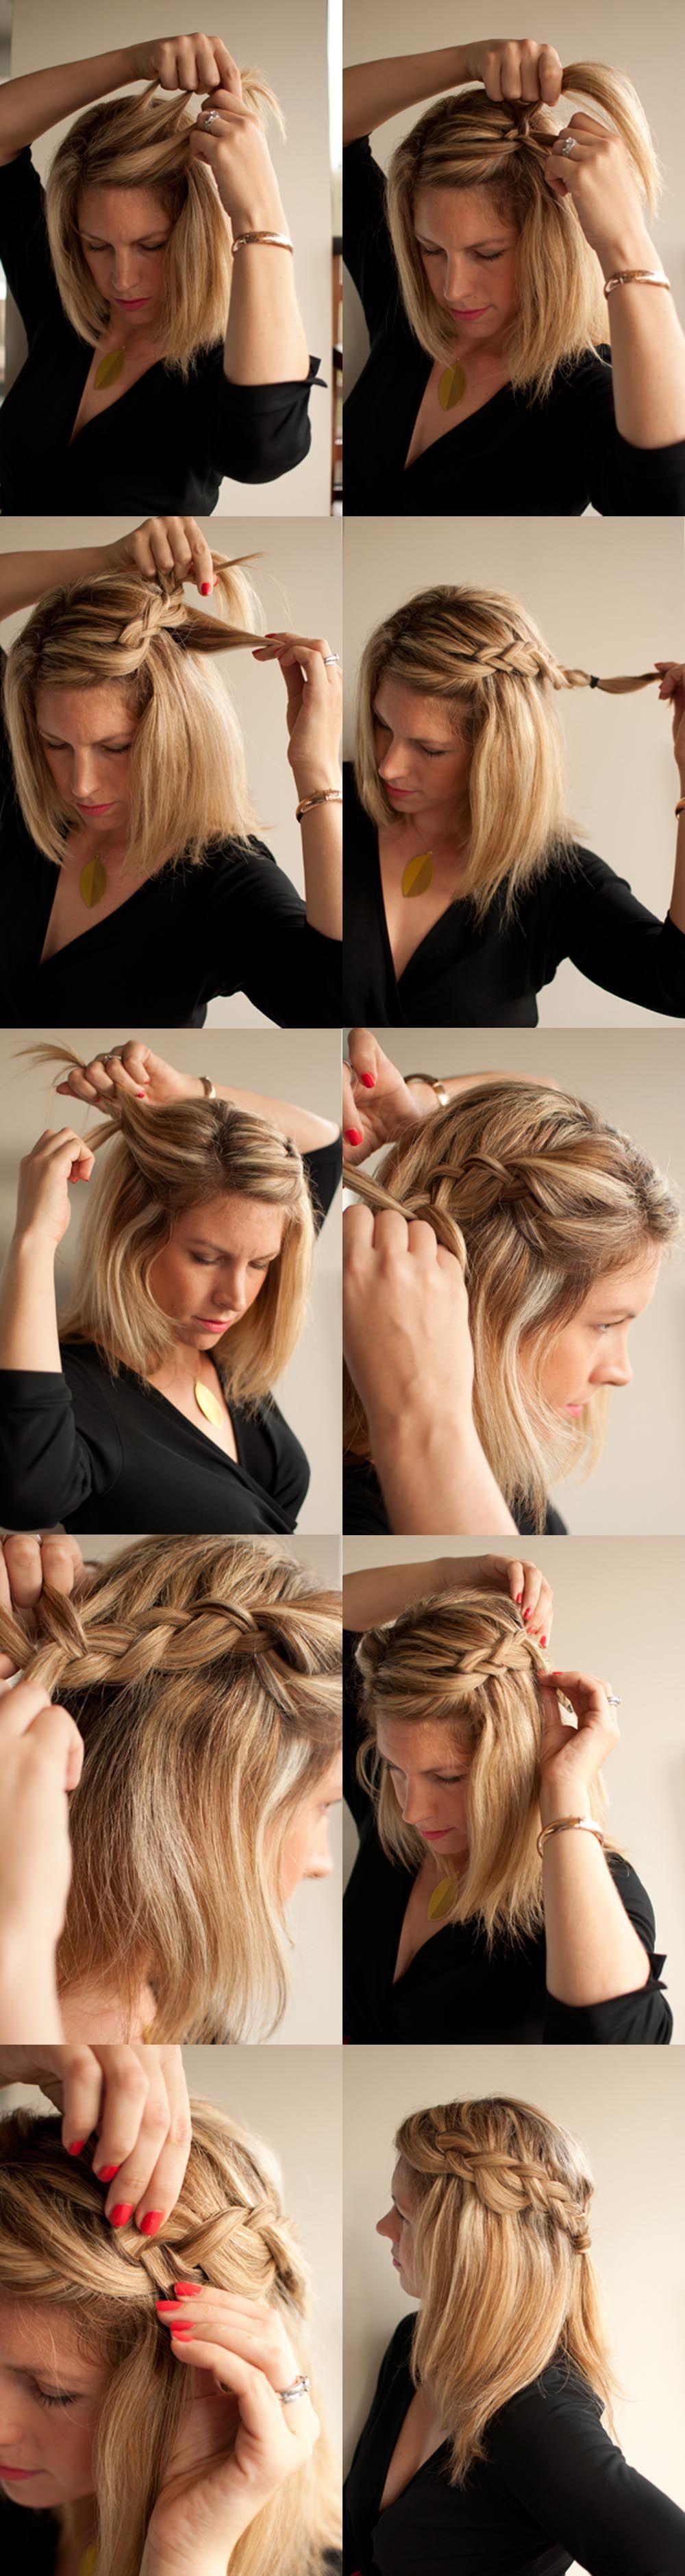 Howto easy braid hairstyle u hair romance reader question plait